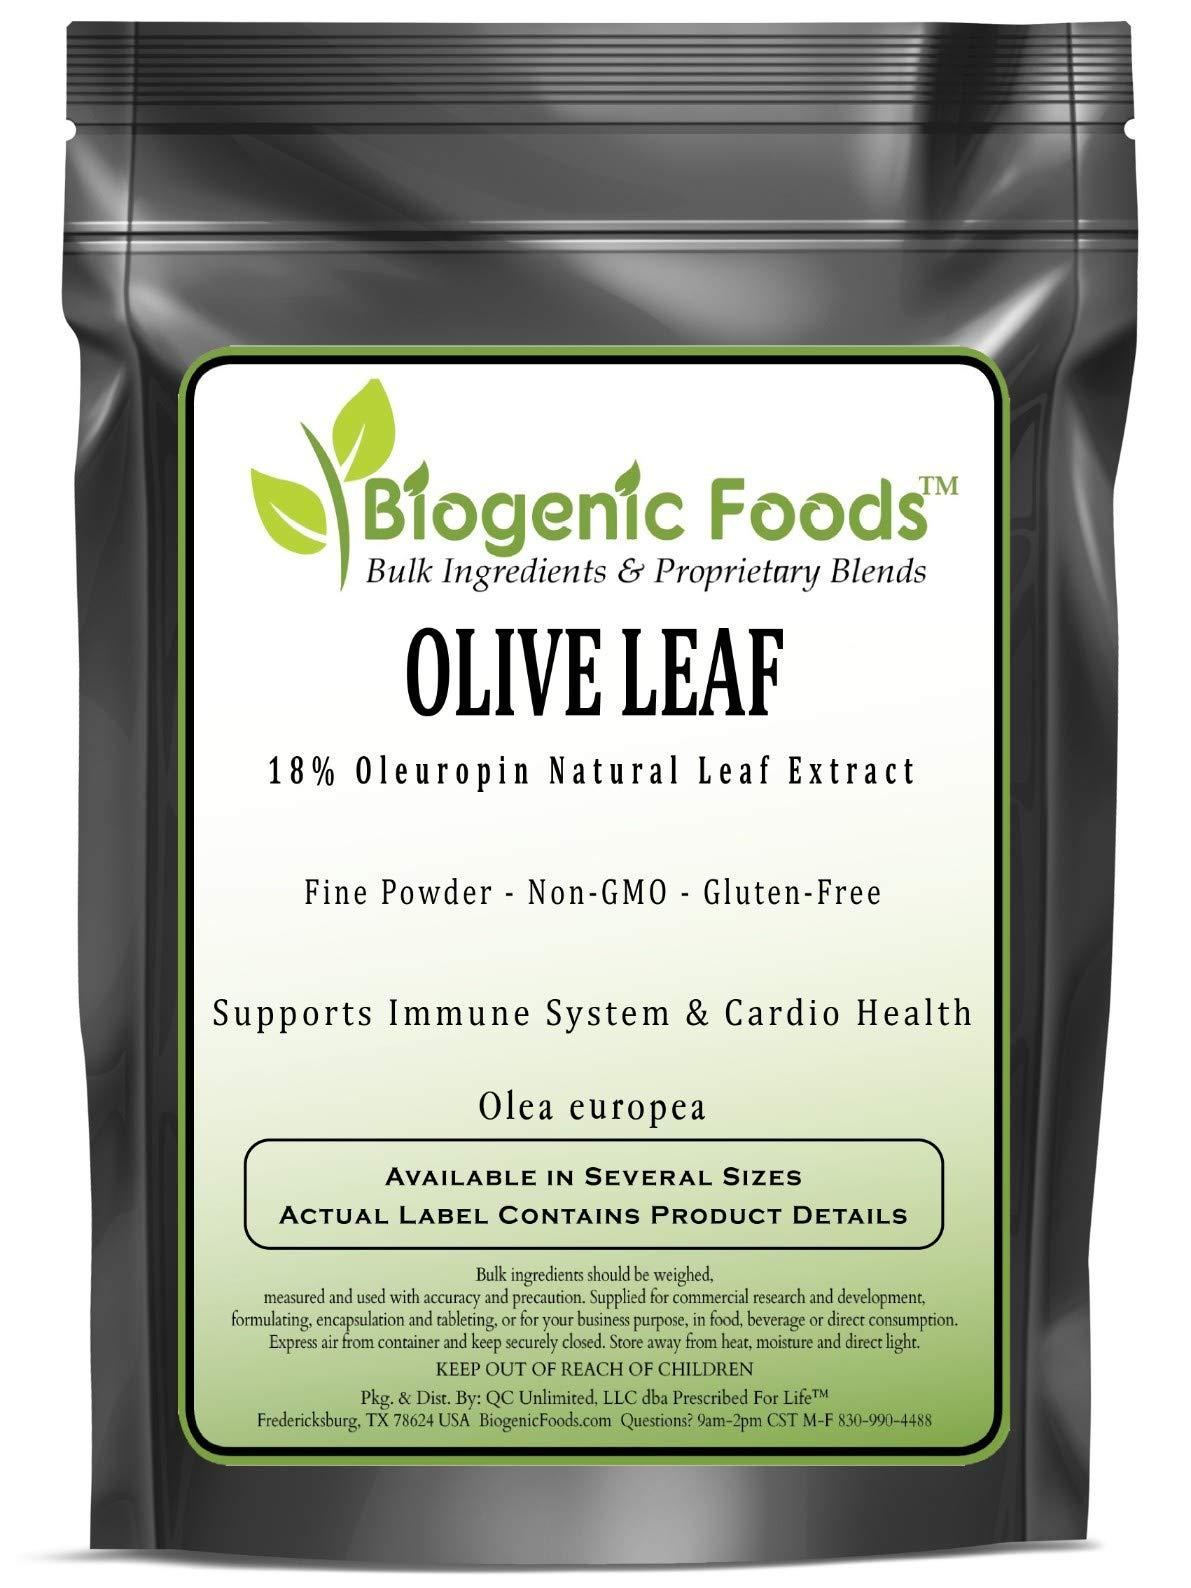 Olive Leaf - 18% Oleuropin Natural Leaf Fine Powder Extract (Olea Europea), 1 kg